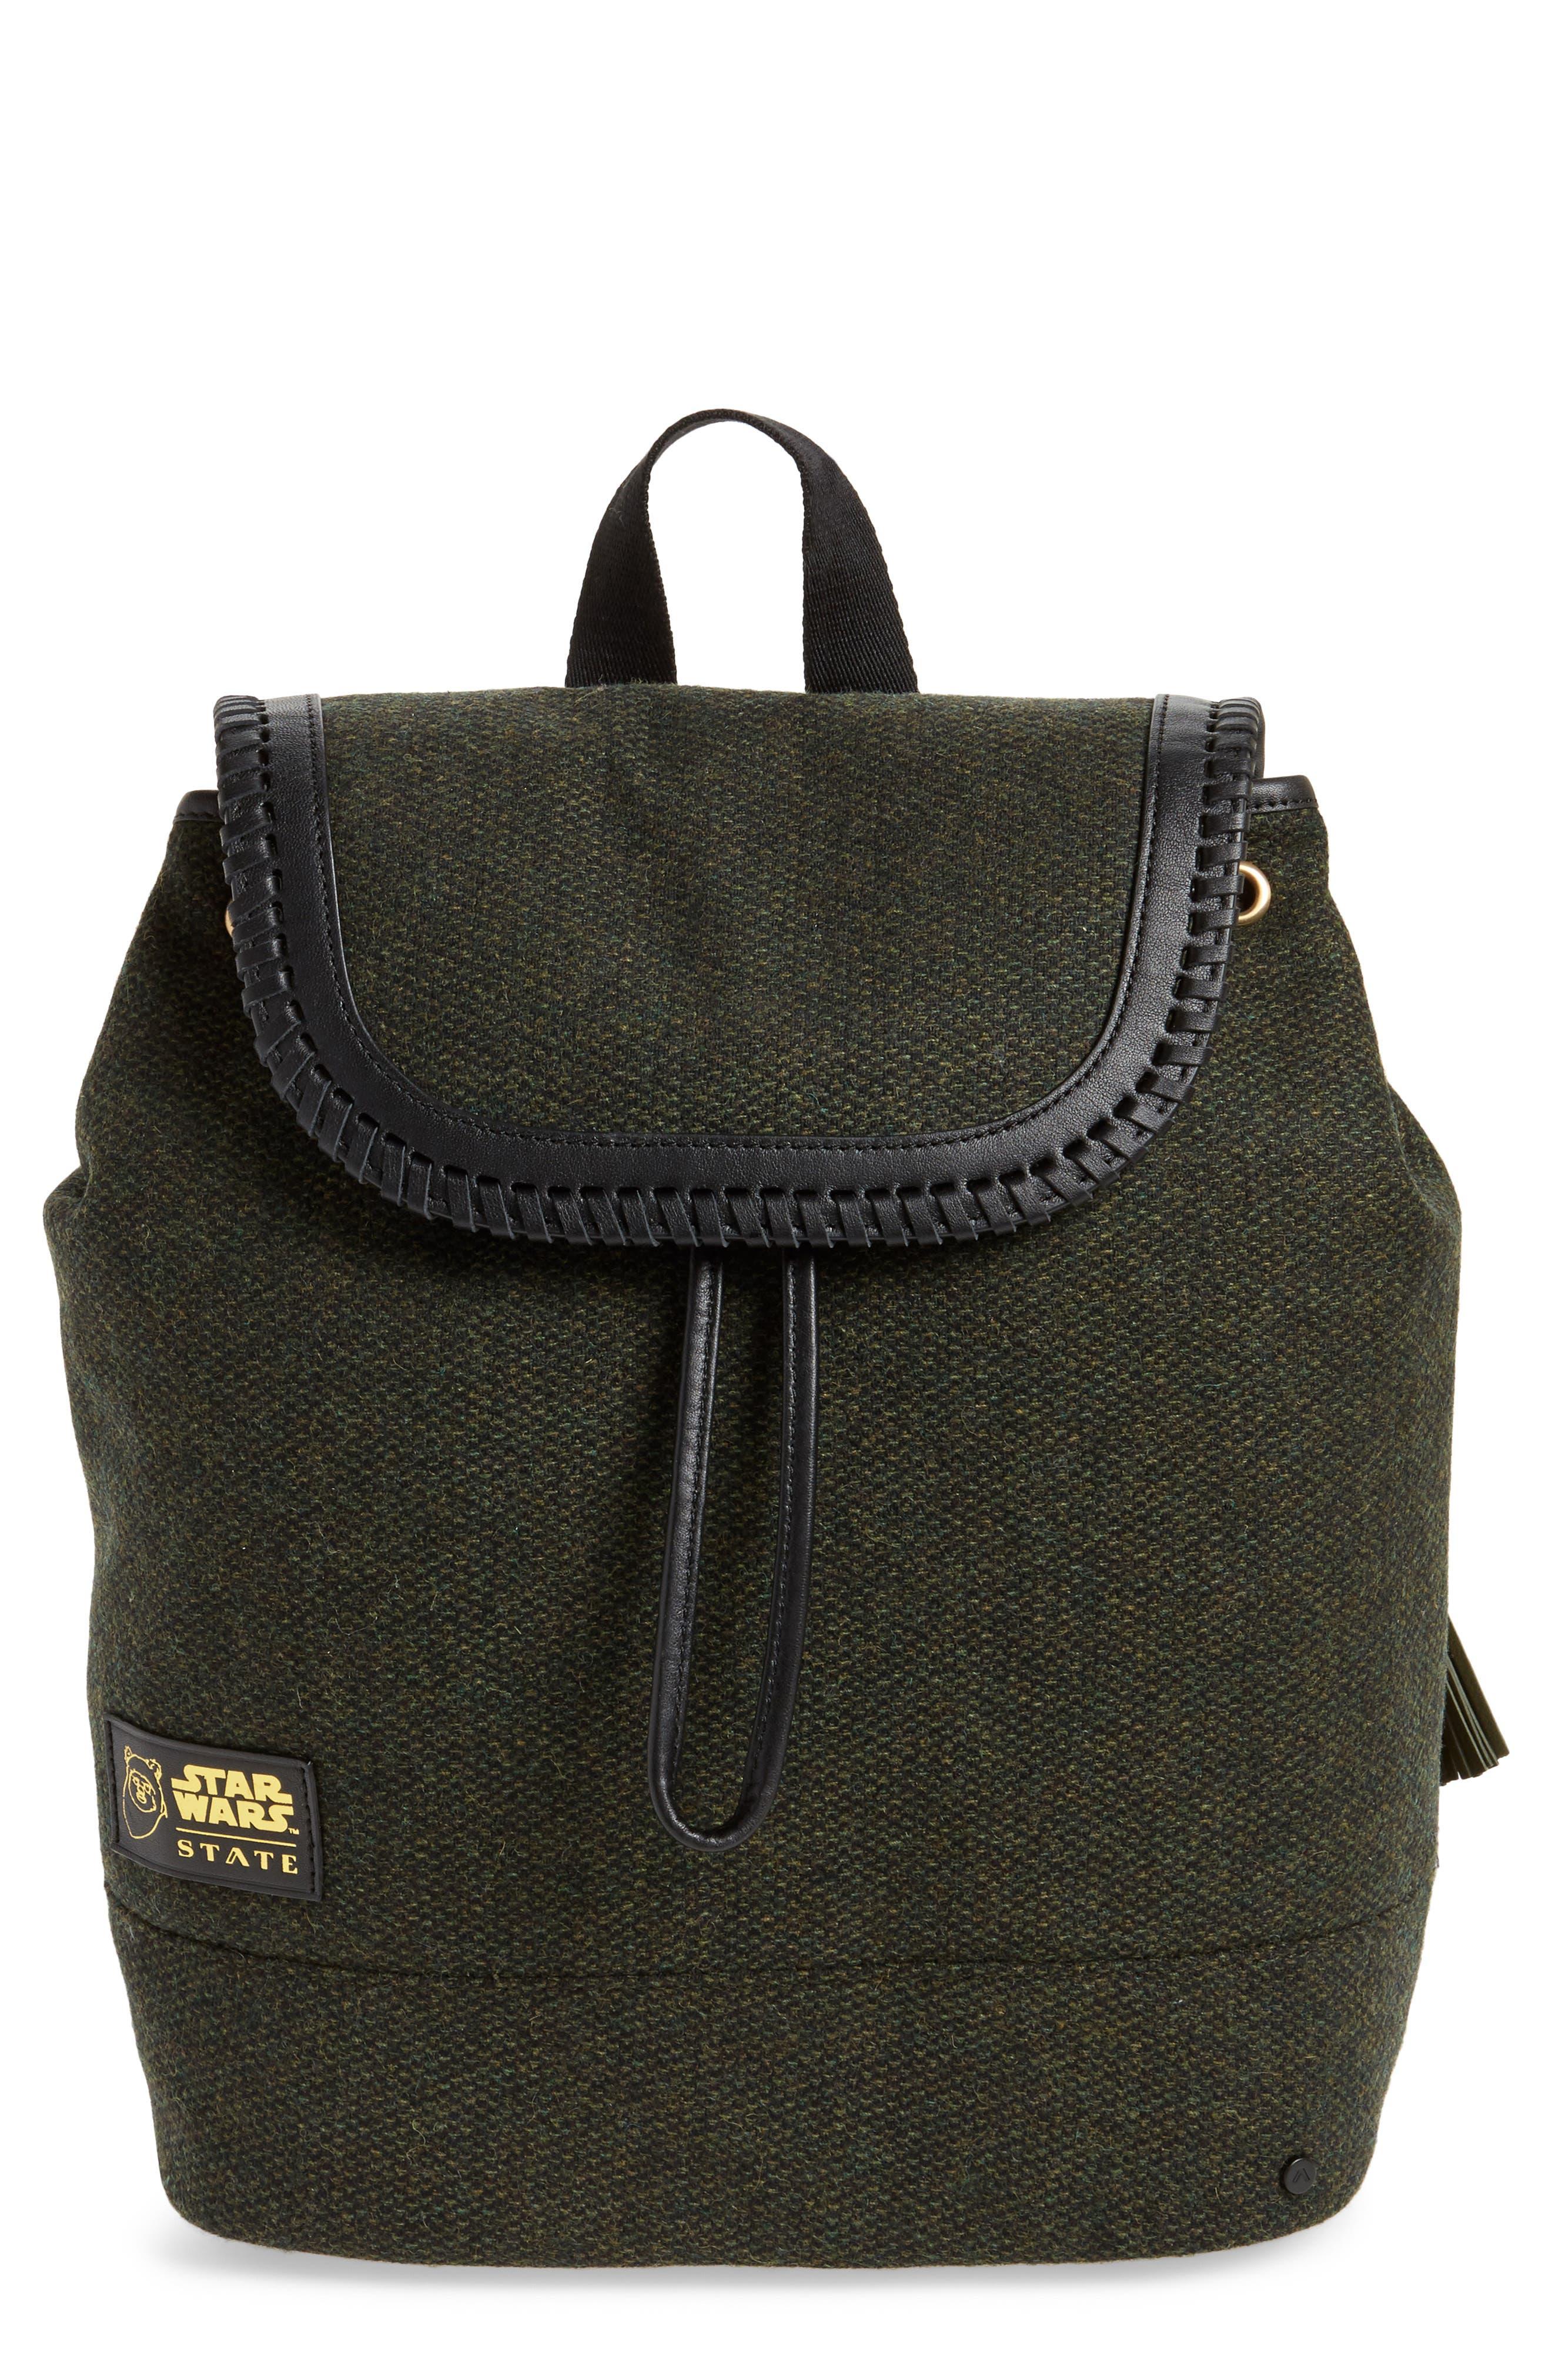 Alternate Image 1 Selected - STATE Bags Star Wars - The Ewoks Hattie Backpack